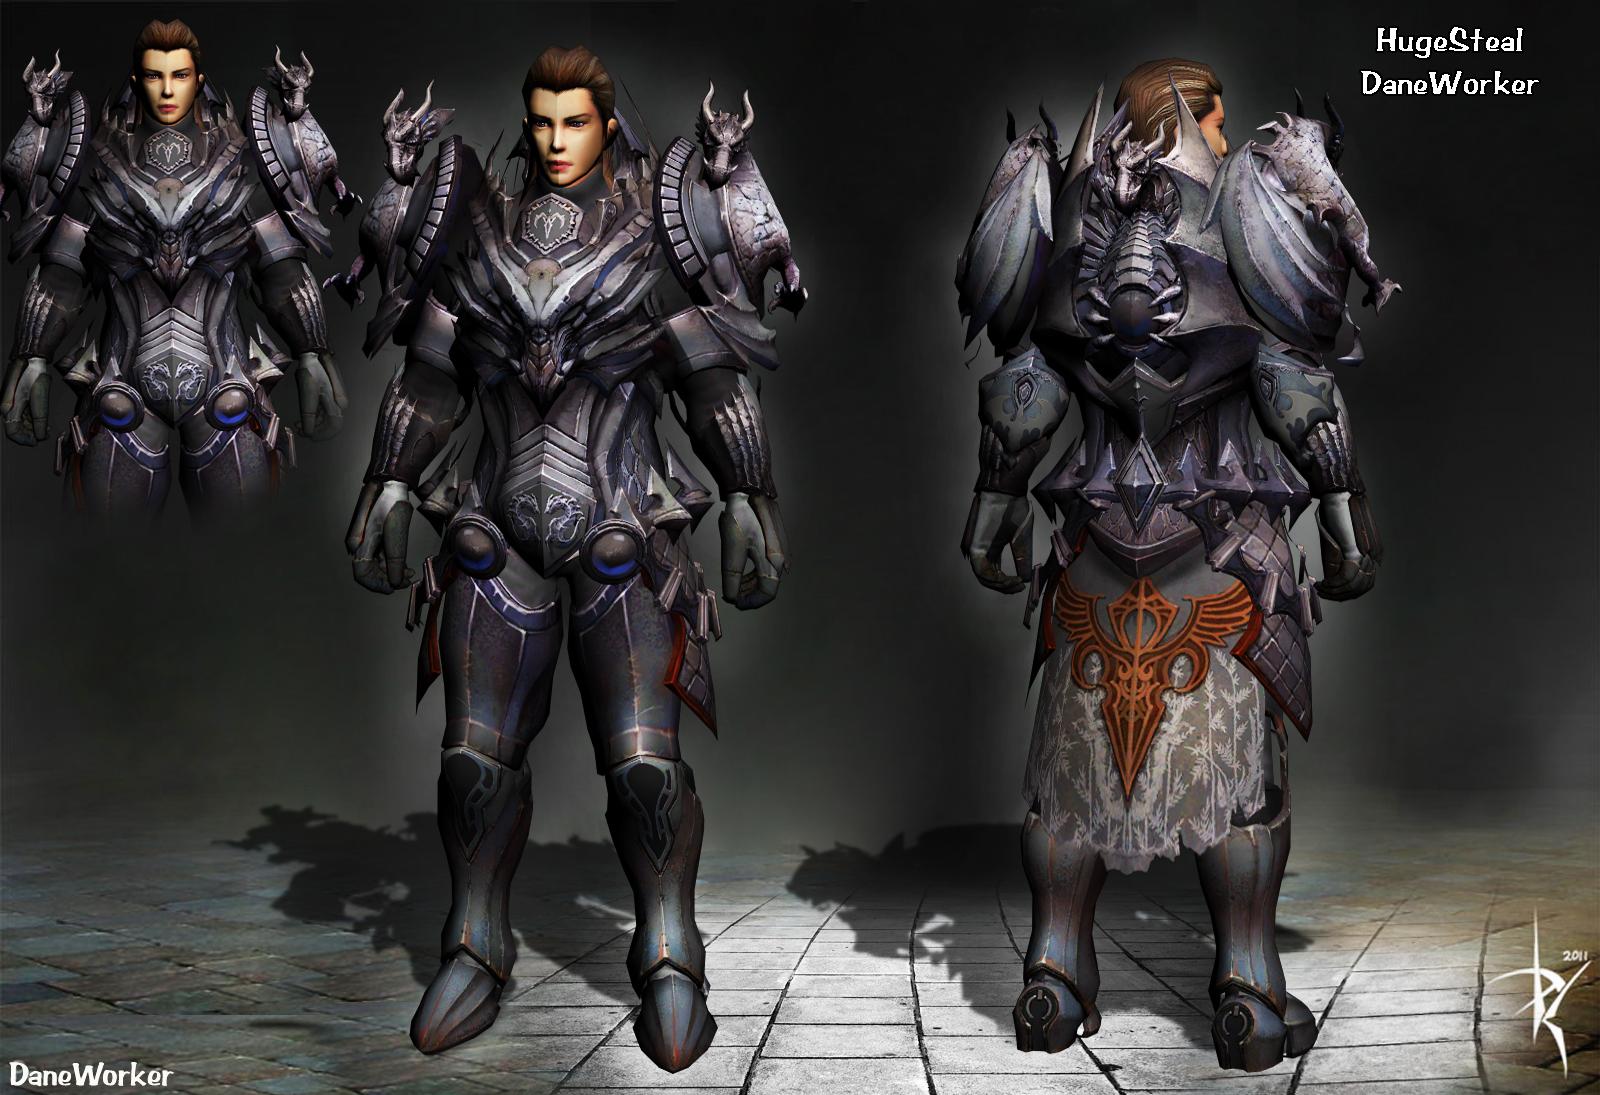 metin2, 3d metin2, costumes metin2, metin2 3d models, metin2 armor, metin2 de, metin2 models, daneworker,